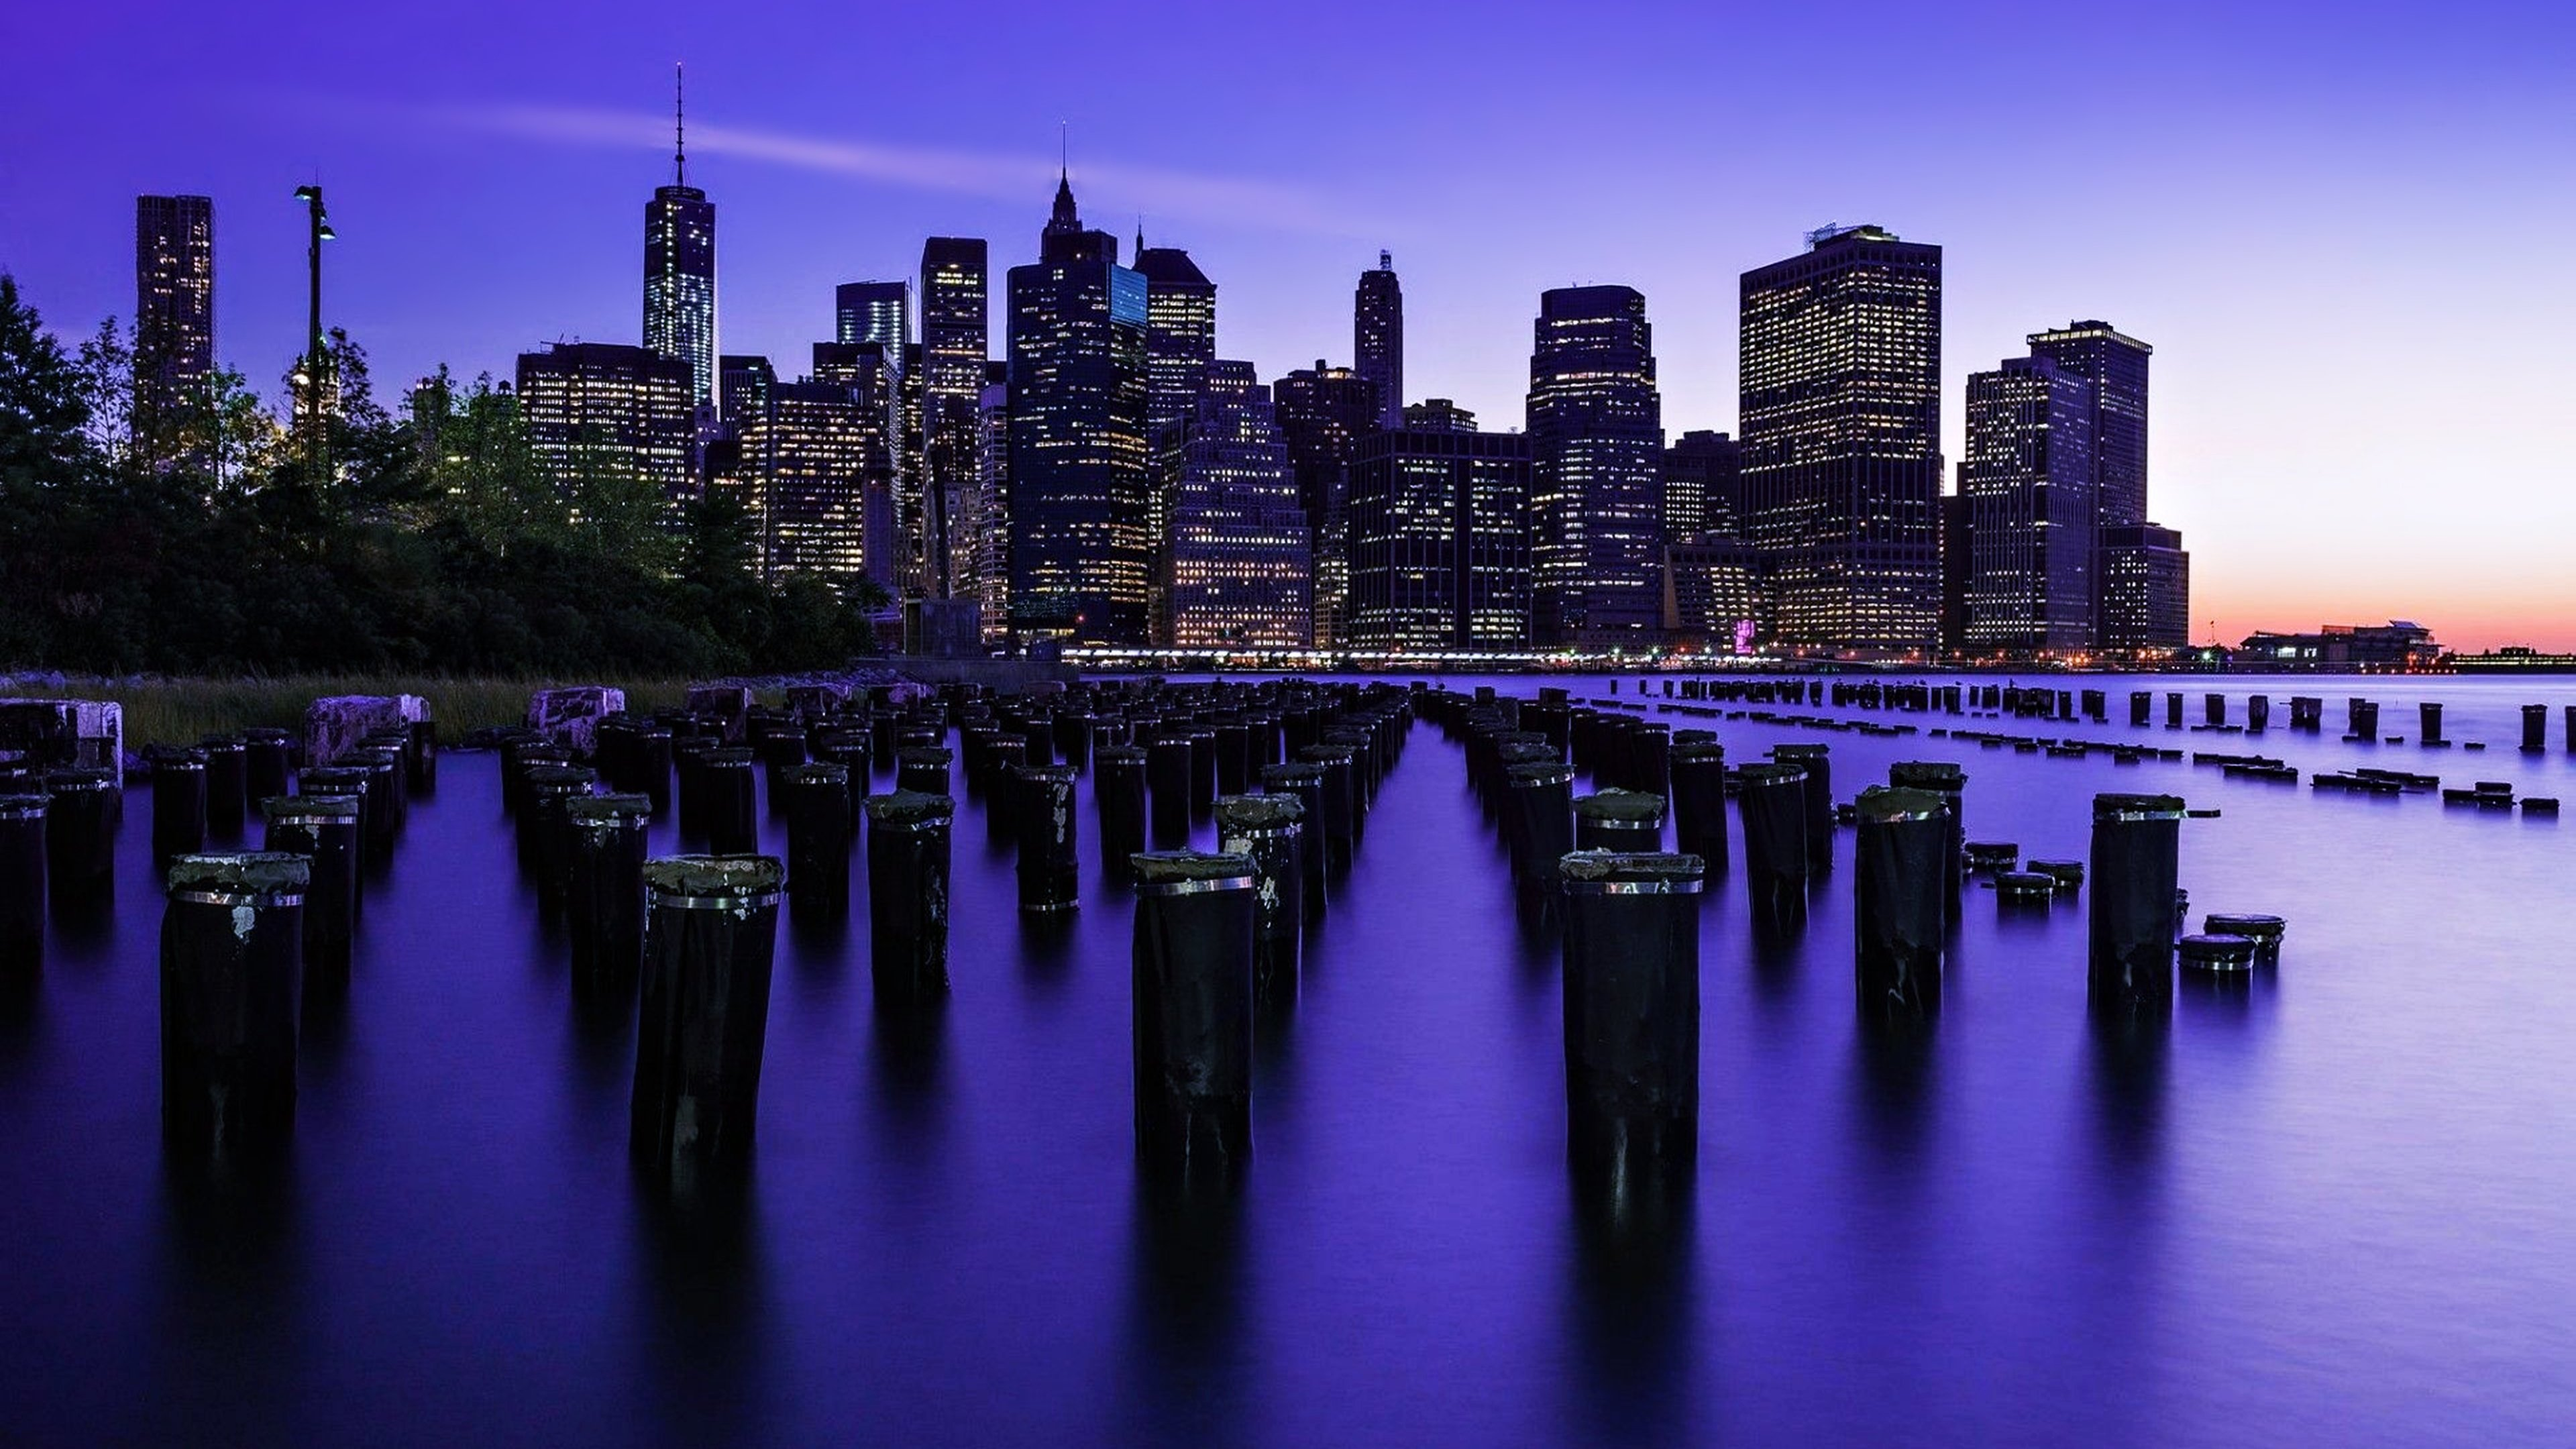 new york city skyscrapers buildings lights sky 1538069534 - New York City Skyscrapers Buildings Lights Sky - world wallpapers, skycrapper wallpapers, sky wallpapers, new york wallpapers, hd-wallpapers, city wallpapers, 4k-wallpapers